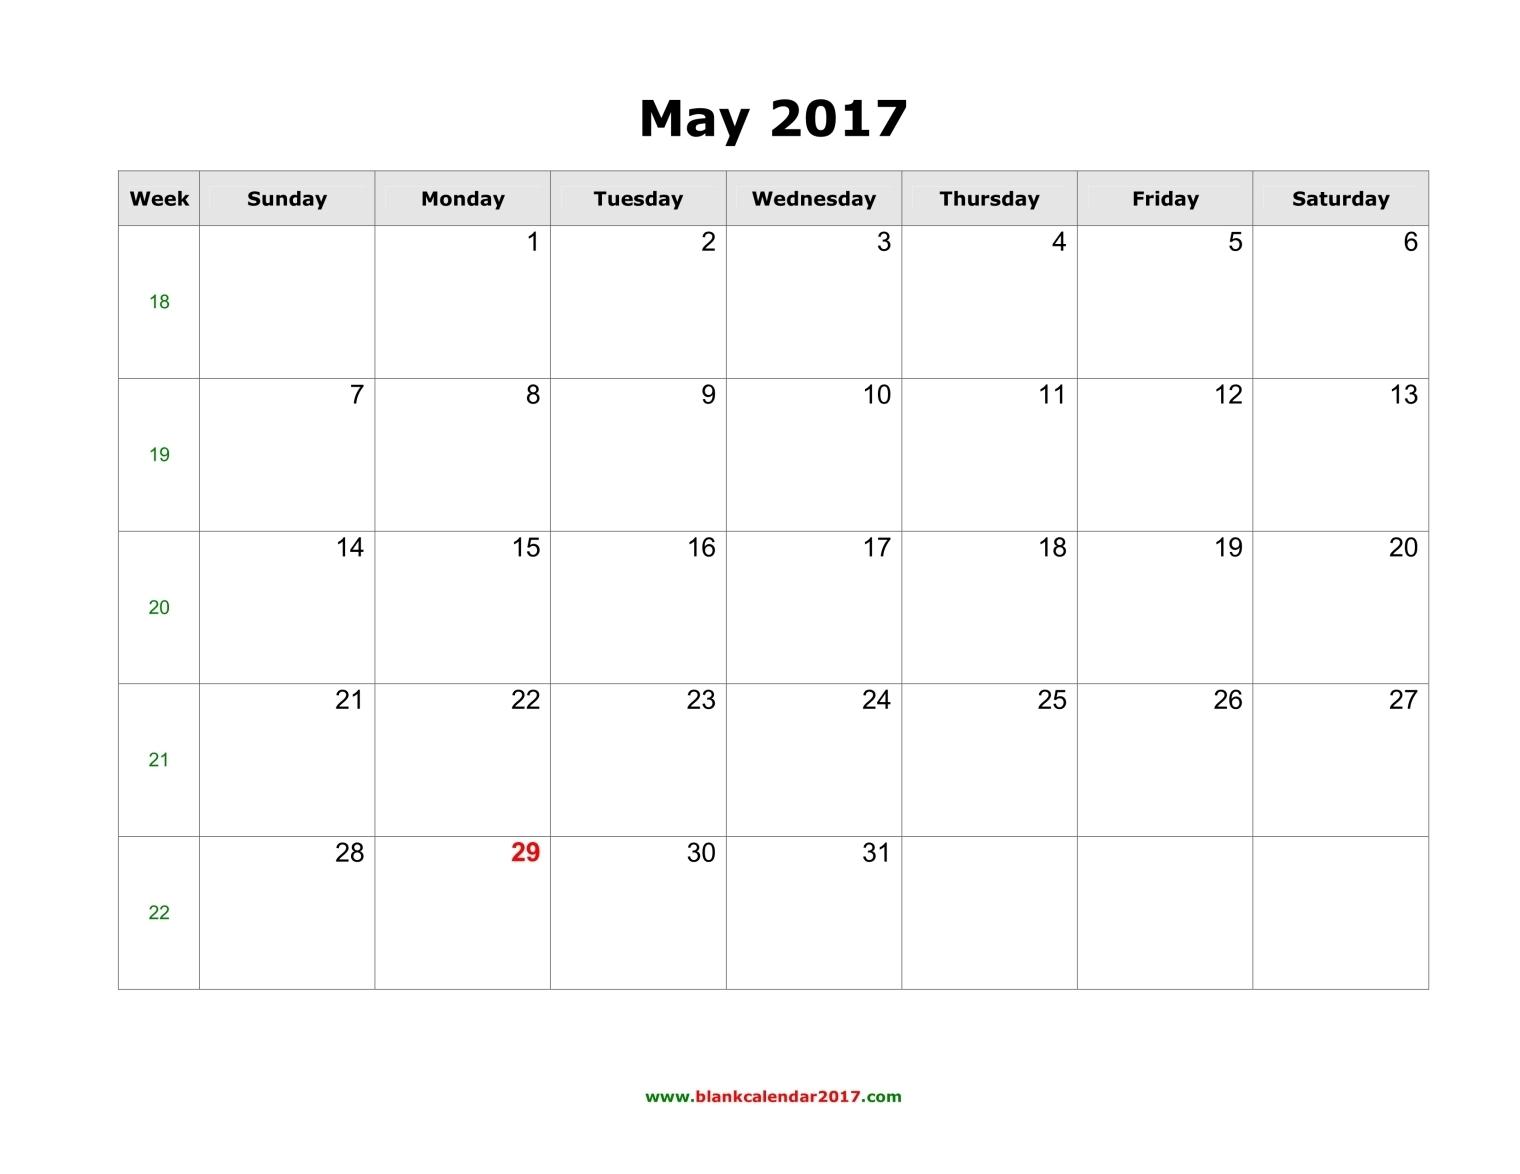 Blank Calendar for May 2017